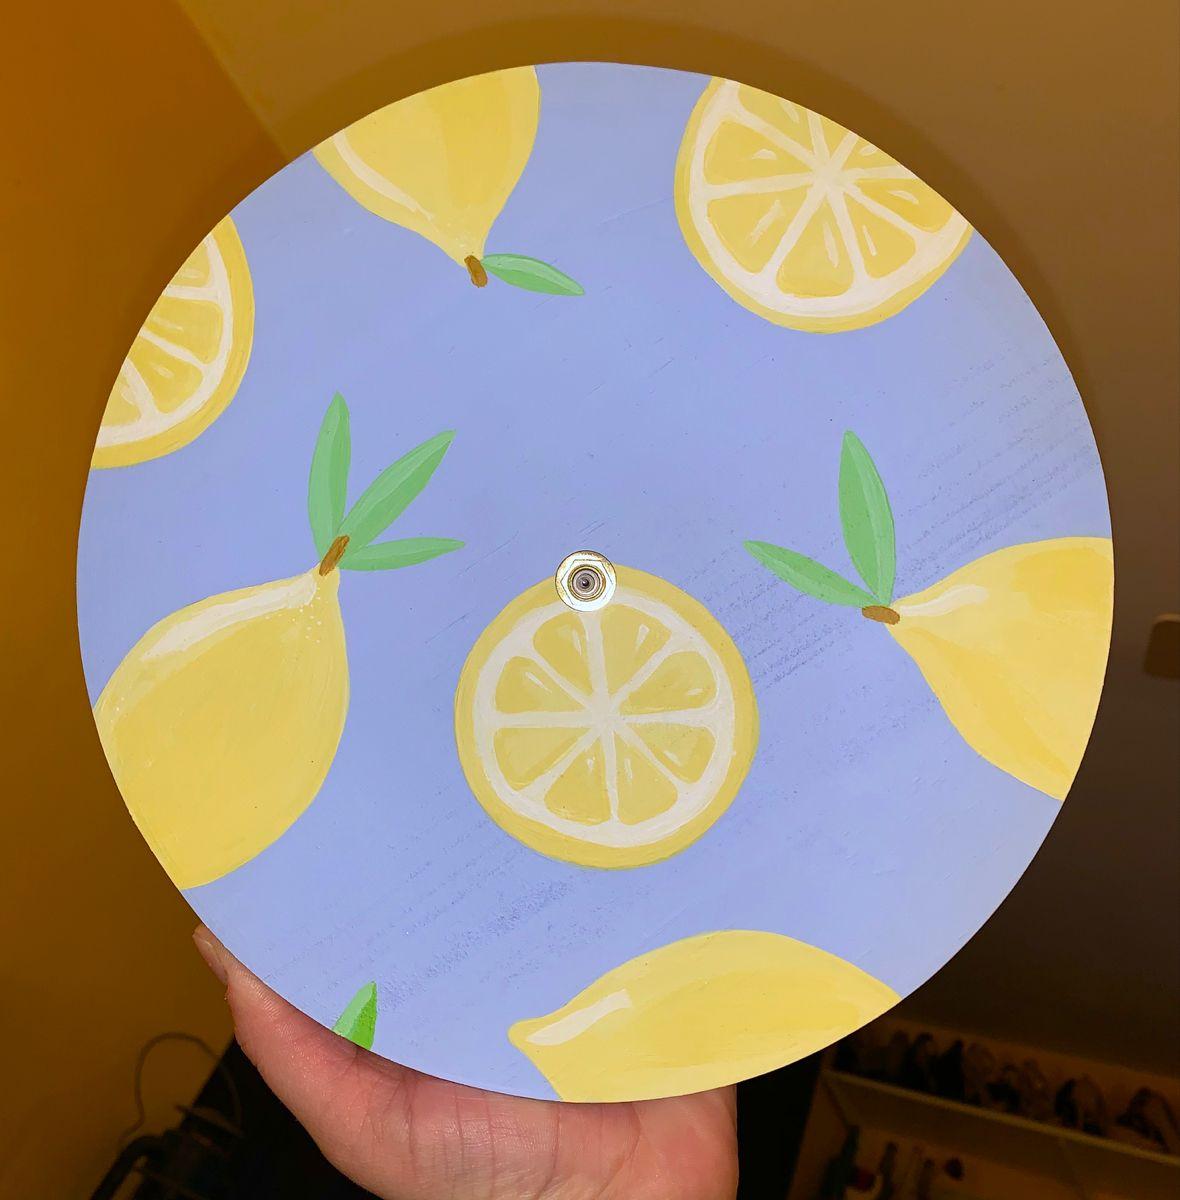 Lemon Print Clock Hand Painted Etsy In 2020 Diy Art Painting Record Wall Art Vinyl Record Art